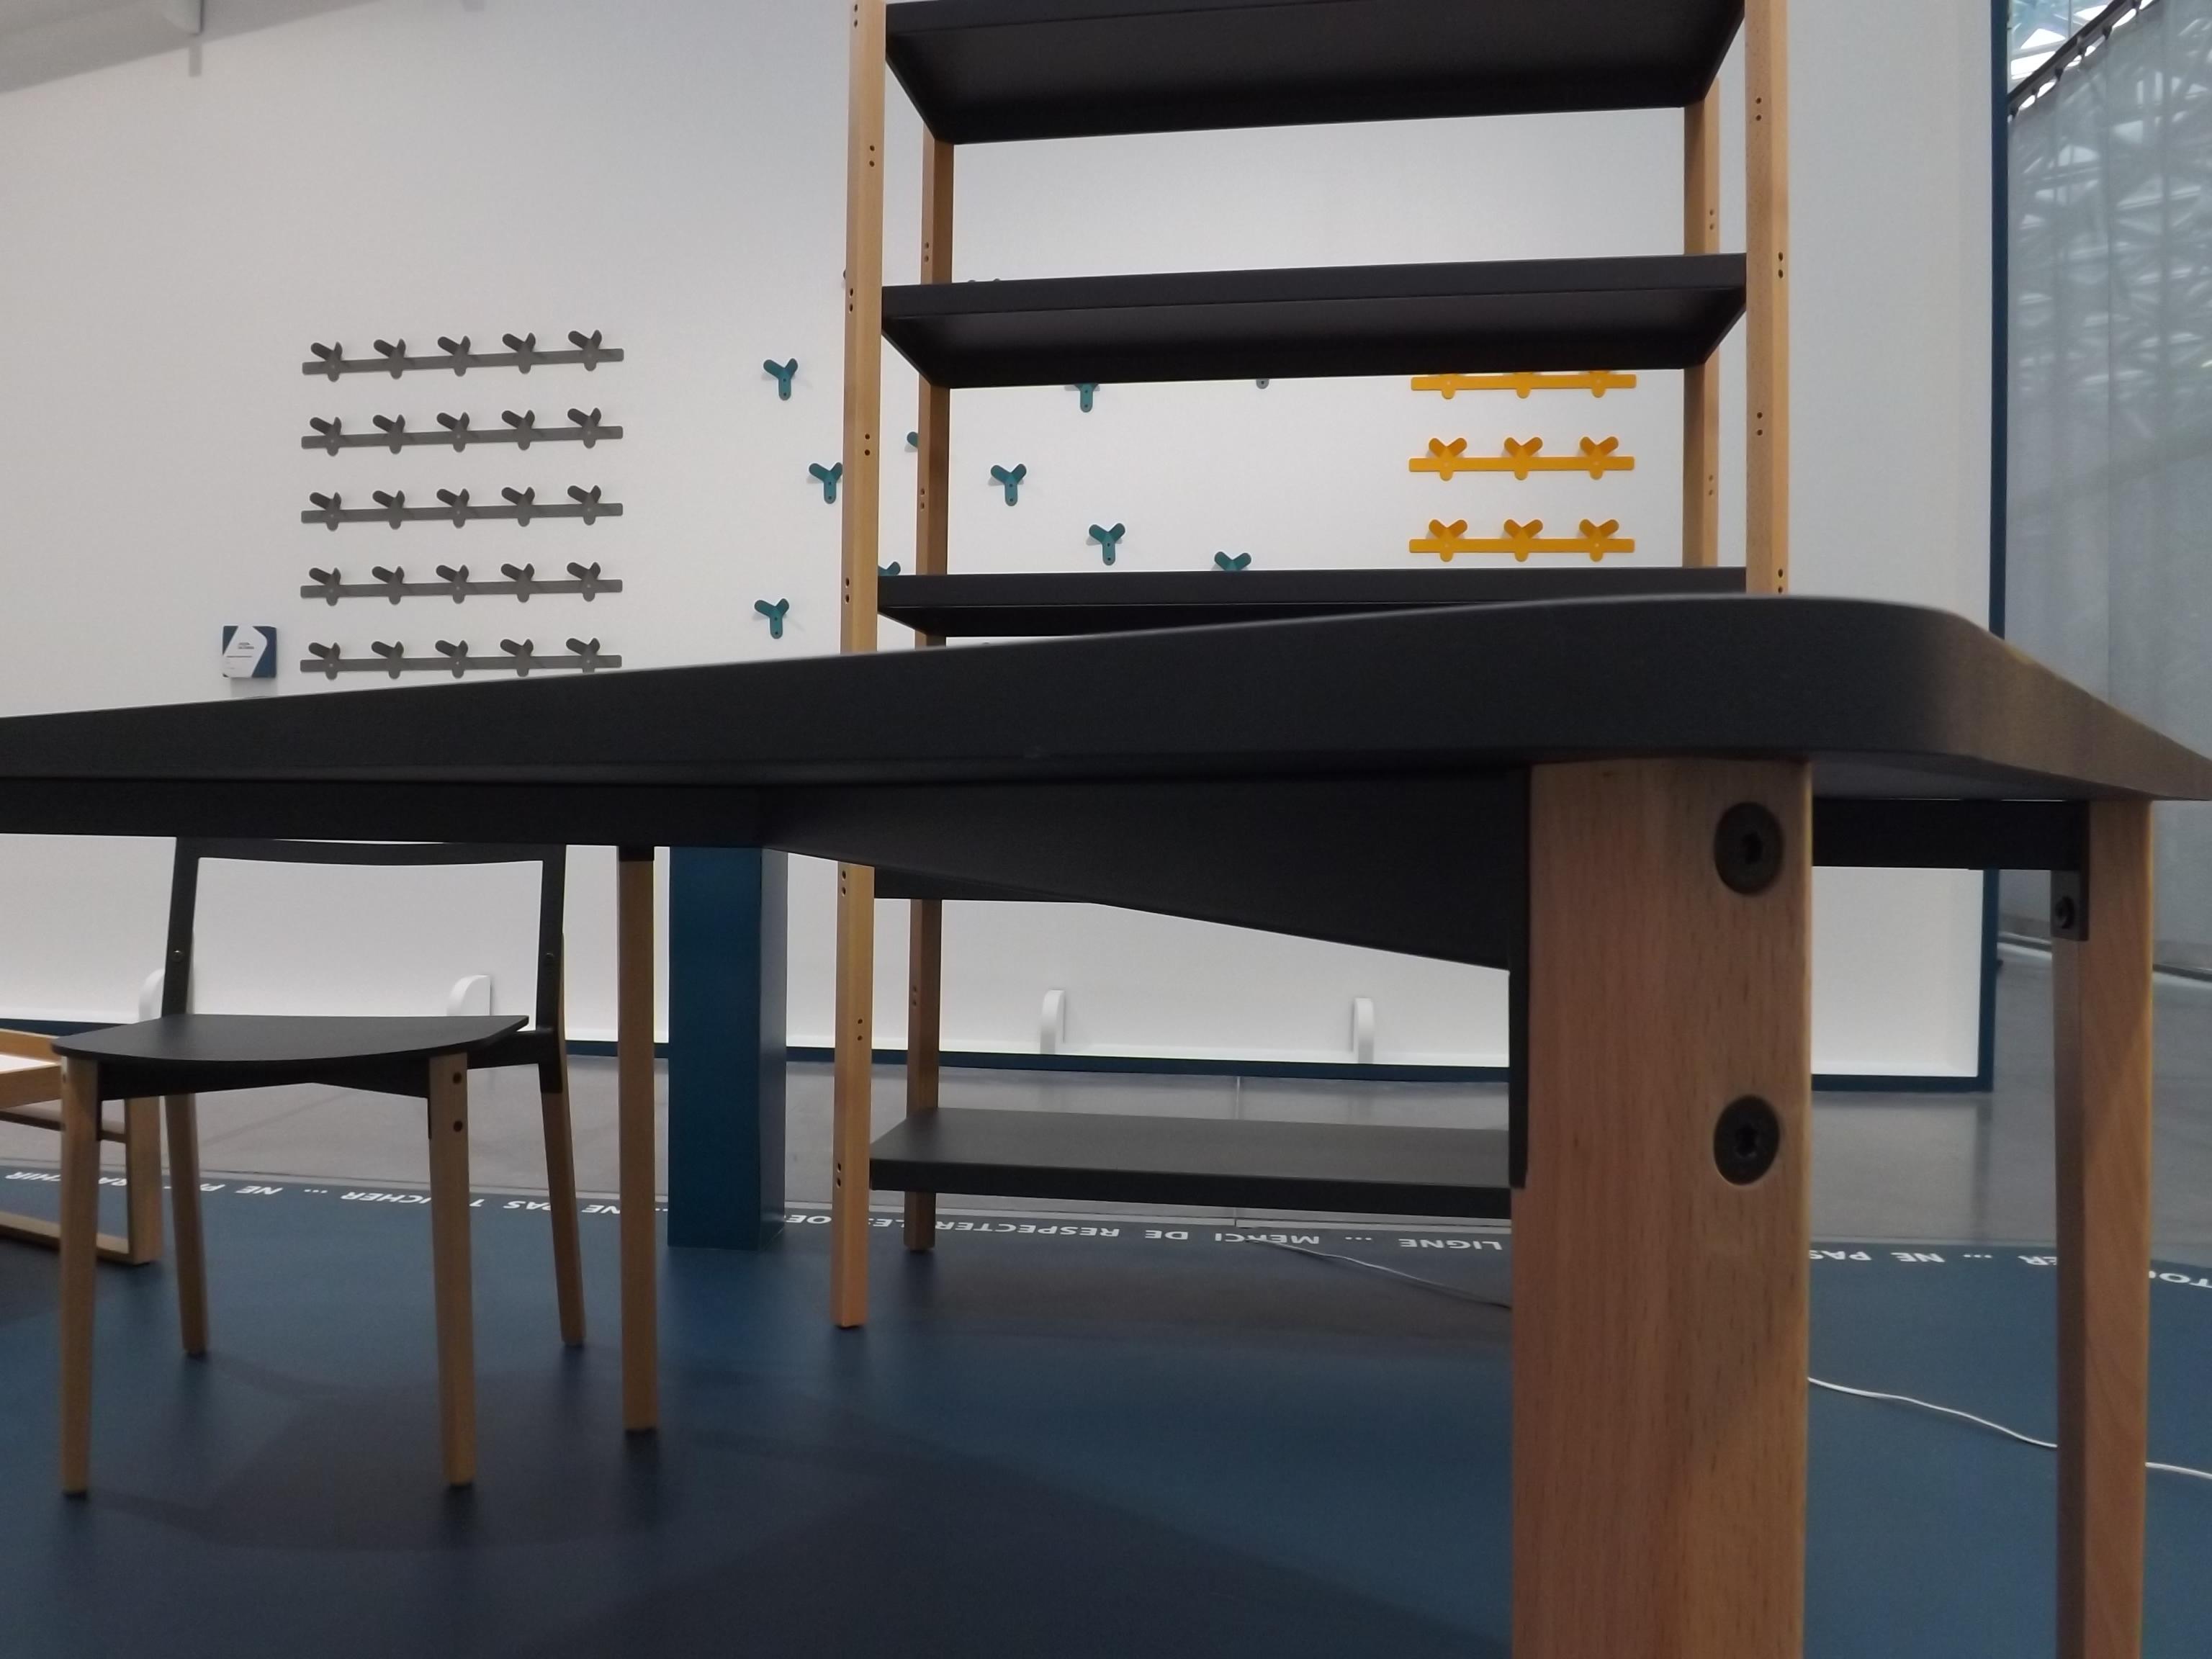 Homework-exposition-esadse-julien-de-sousa-blog-esprit-design